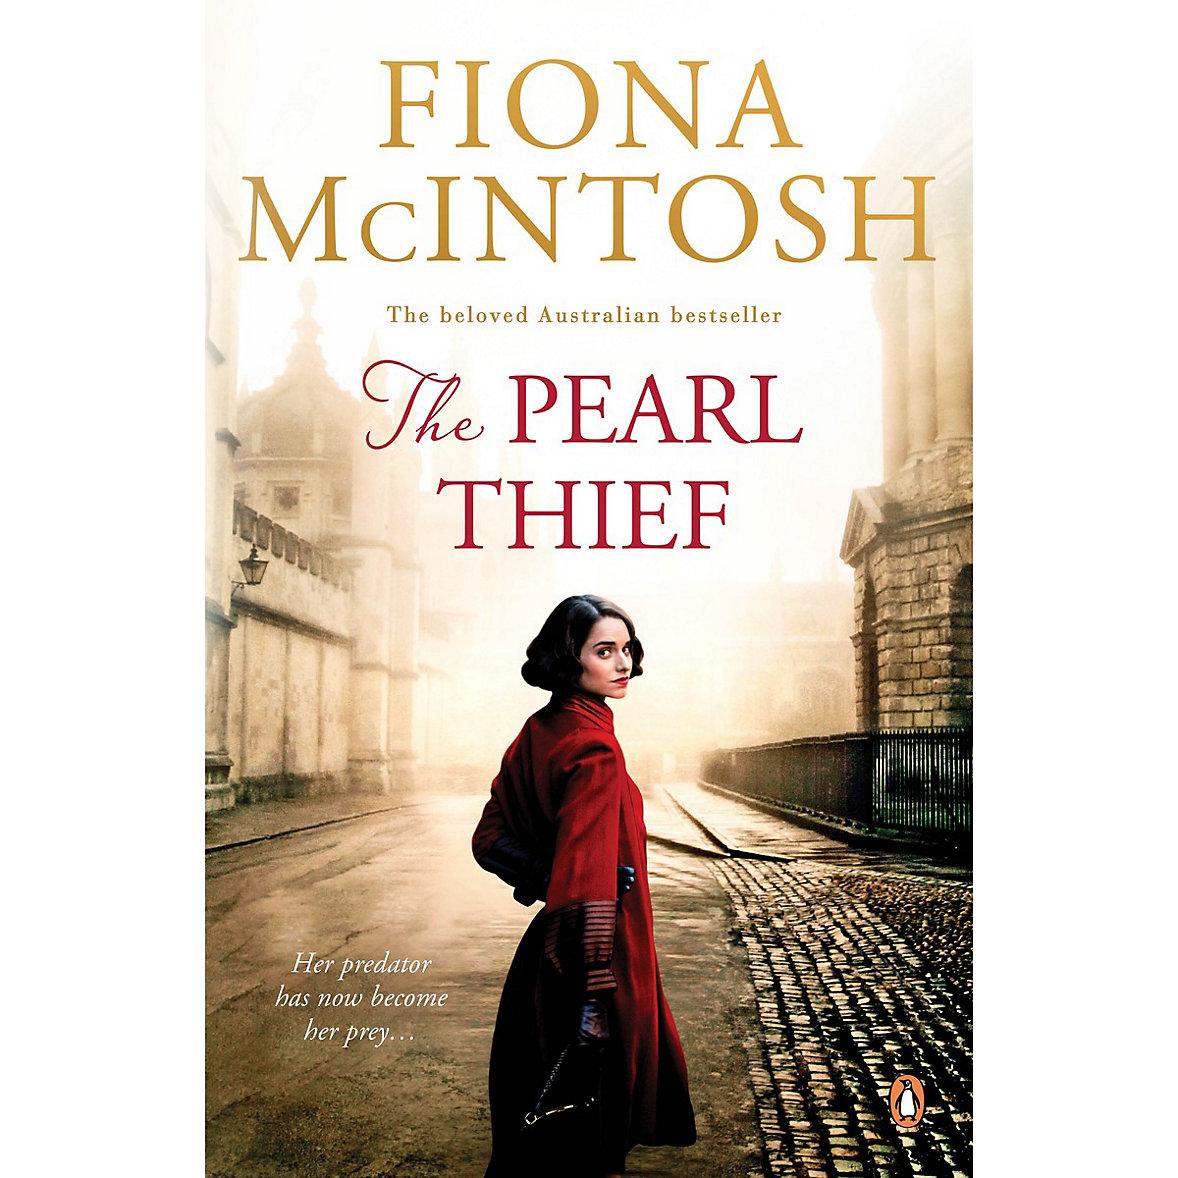 The Pearl Thief - Fiona McIntosh